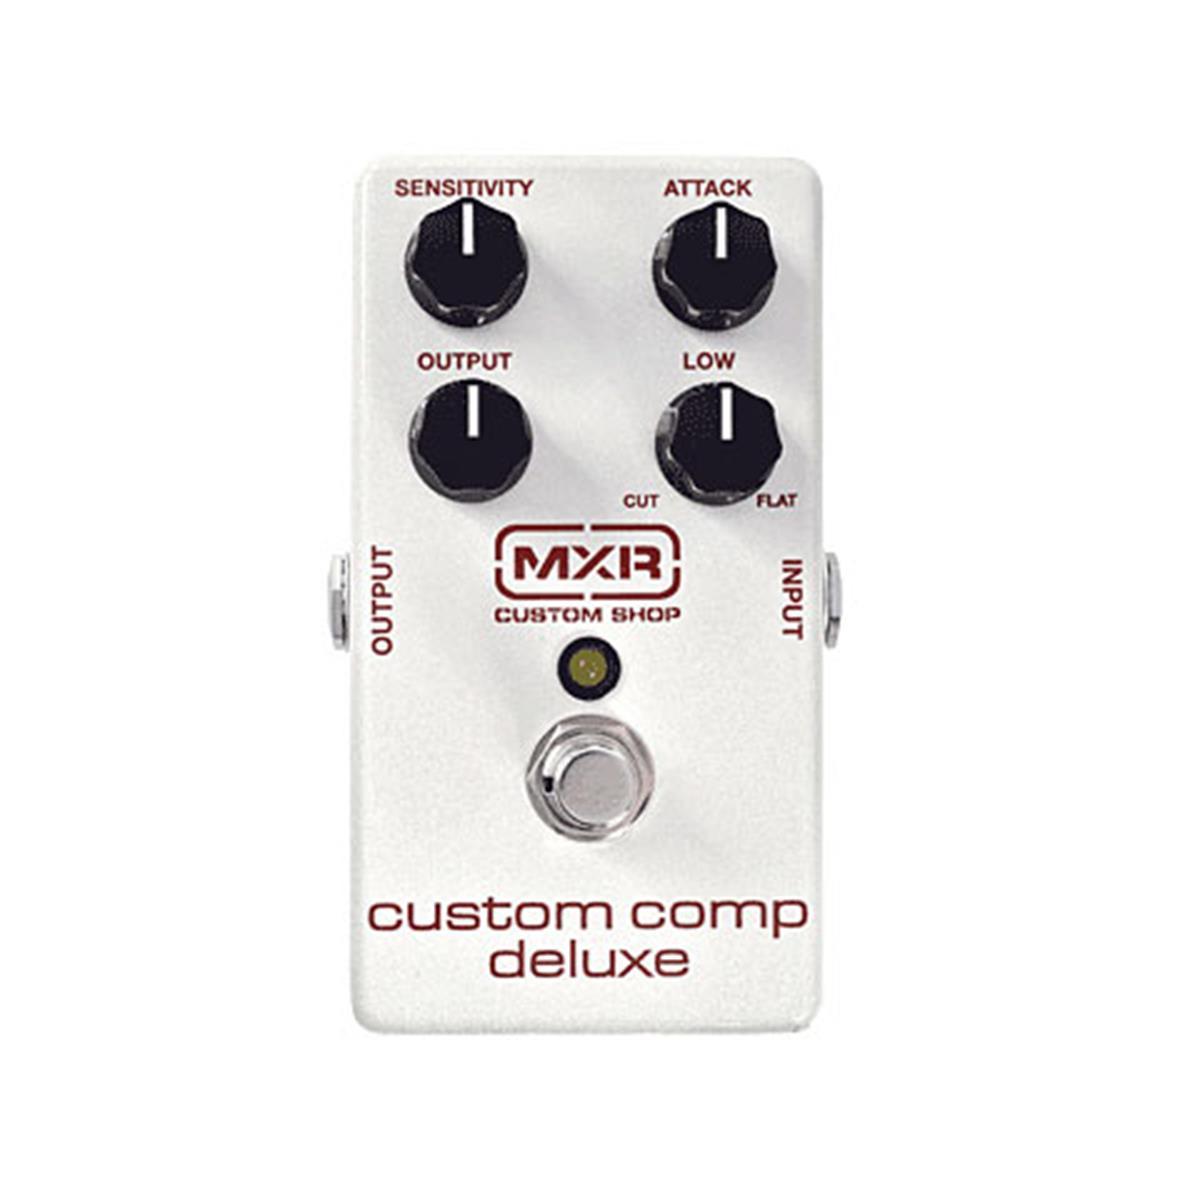 MXR CSP 204 CUSTOM COMP DELUXE 4 KNOBS